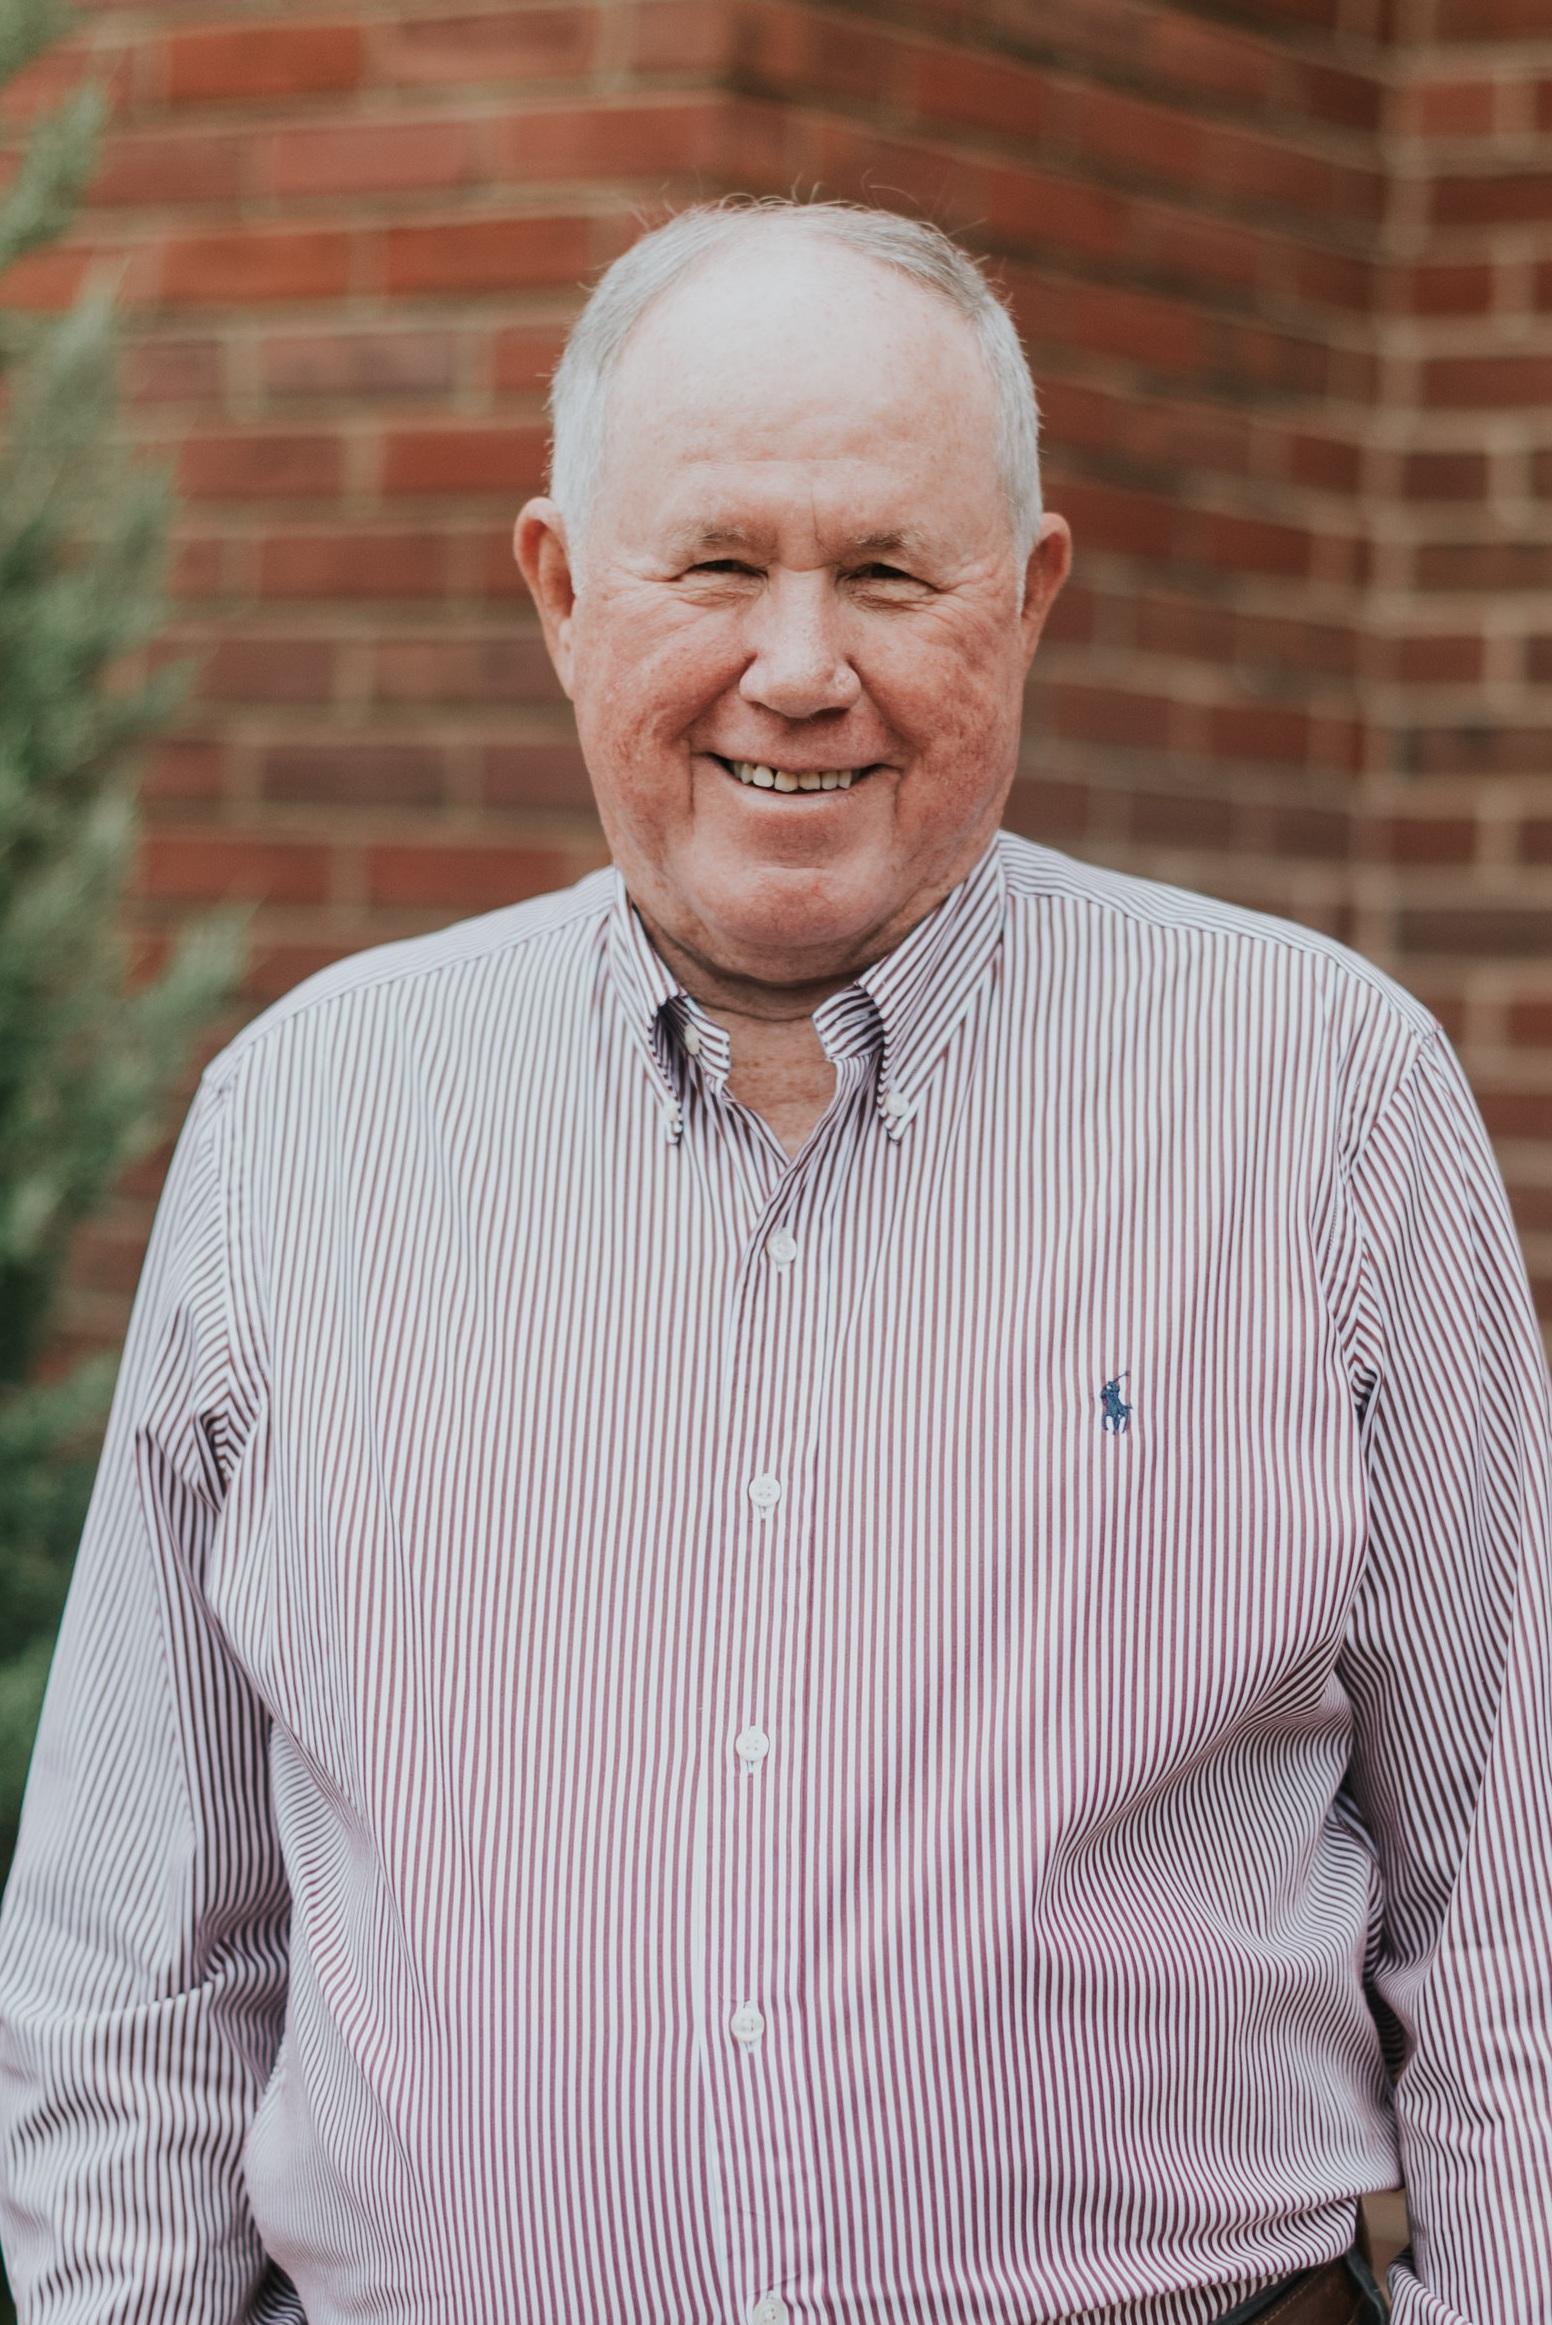 Copy of Jerry Houston (Chairman)